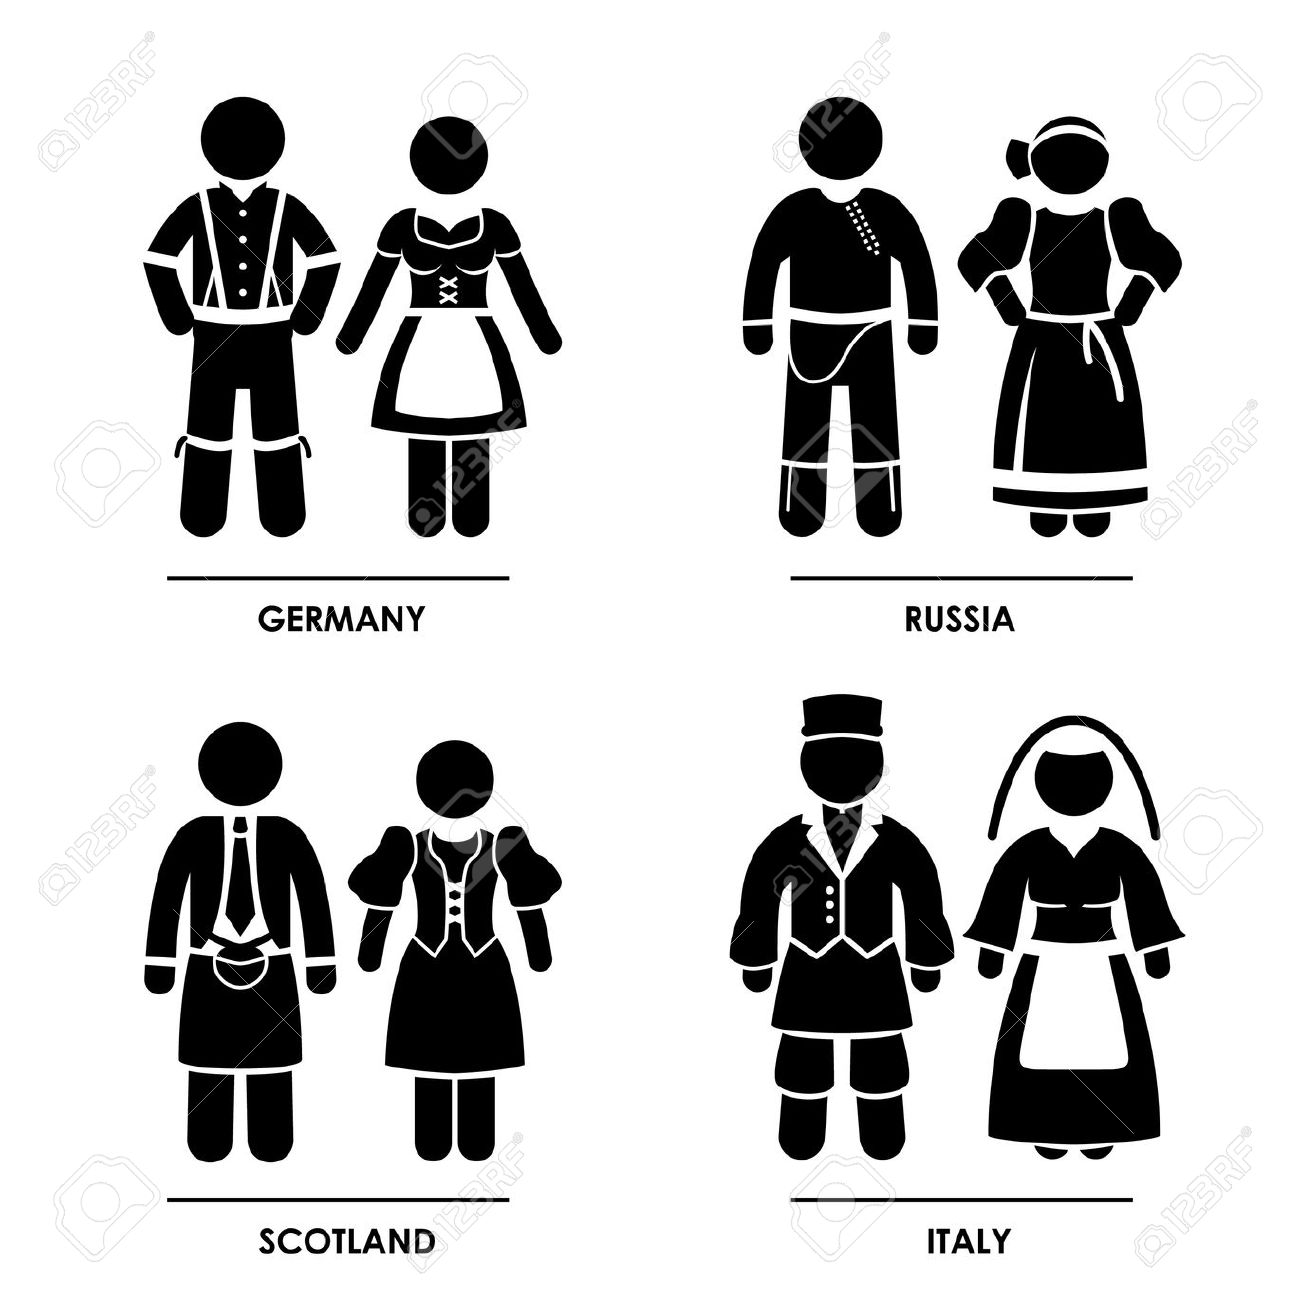 Regional Costumes Clipart